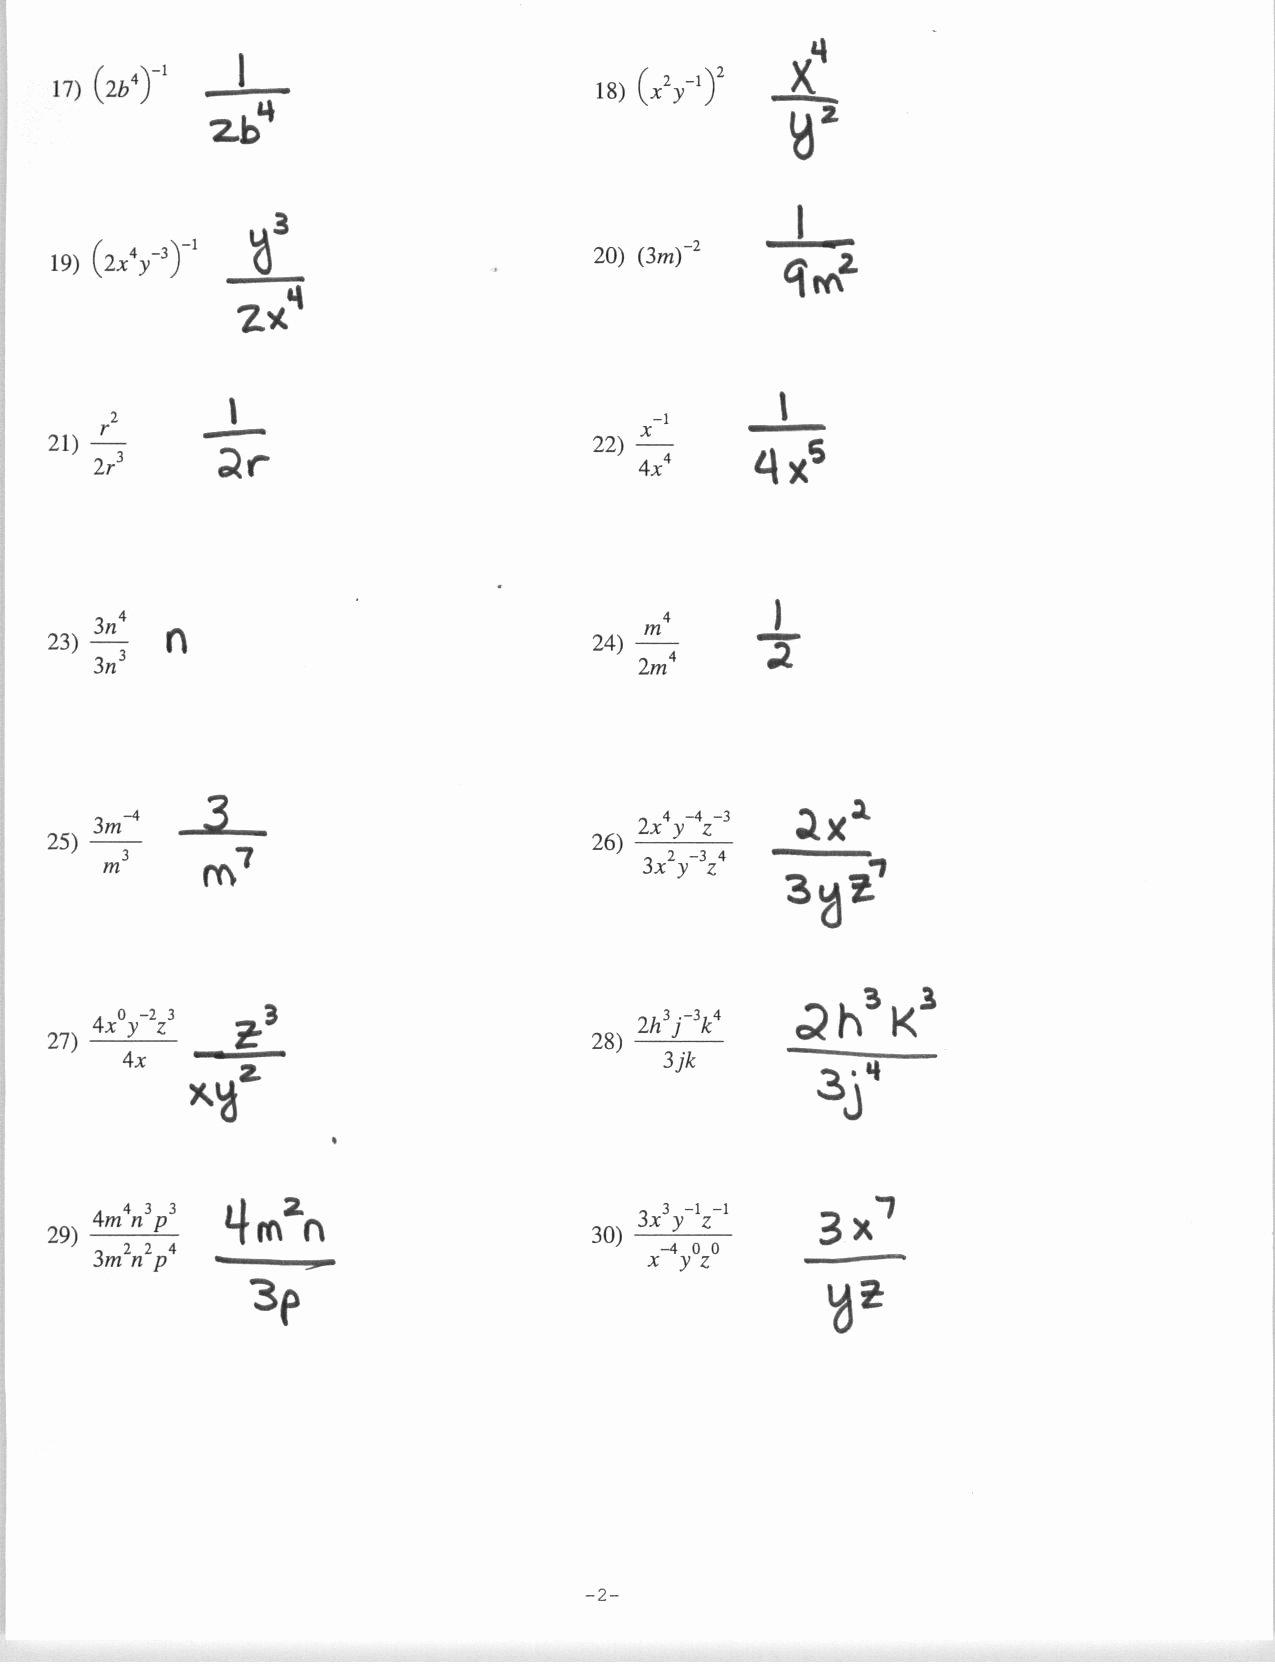 Negative Exponents Worksheet Pdf Awesome Exponents Worksheet Grade 7 Pdf